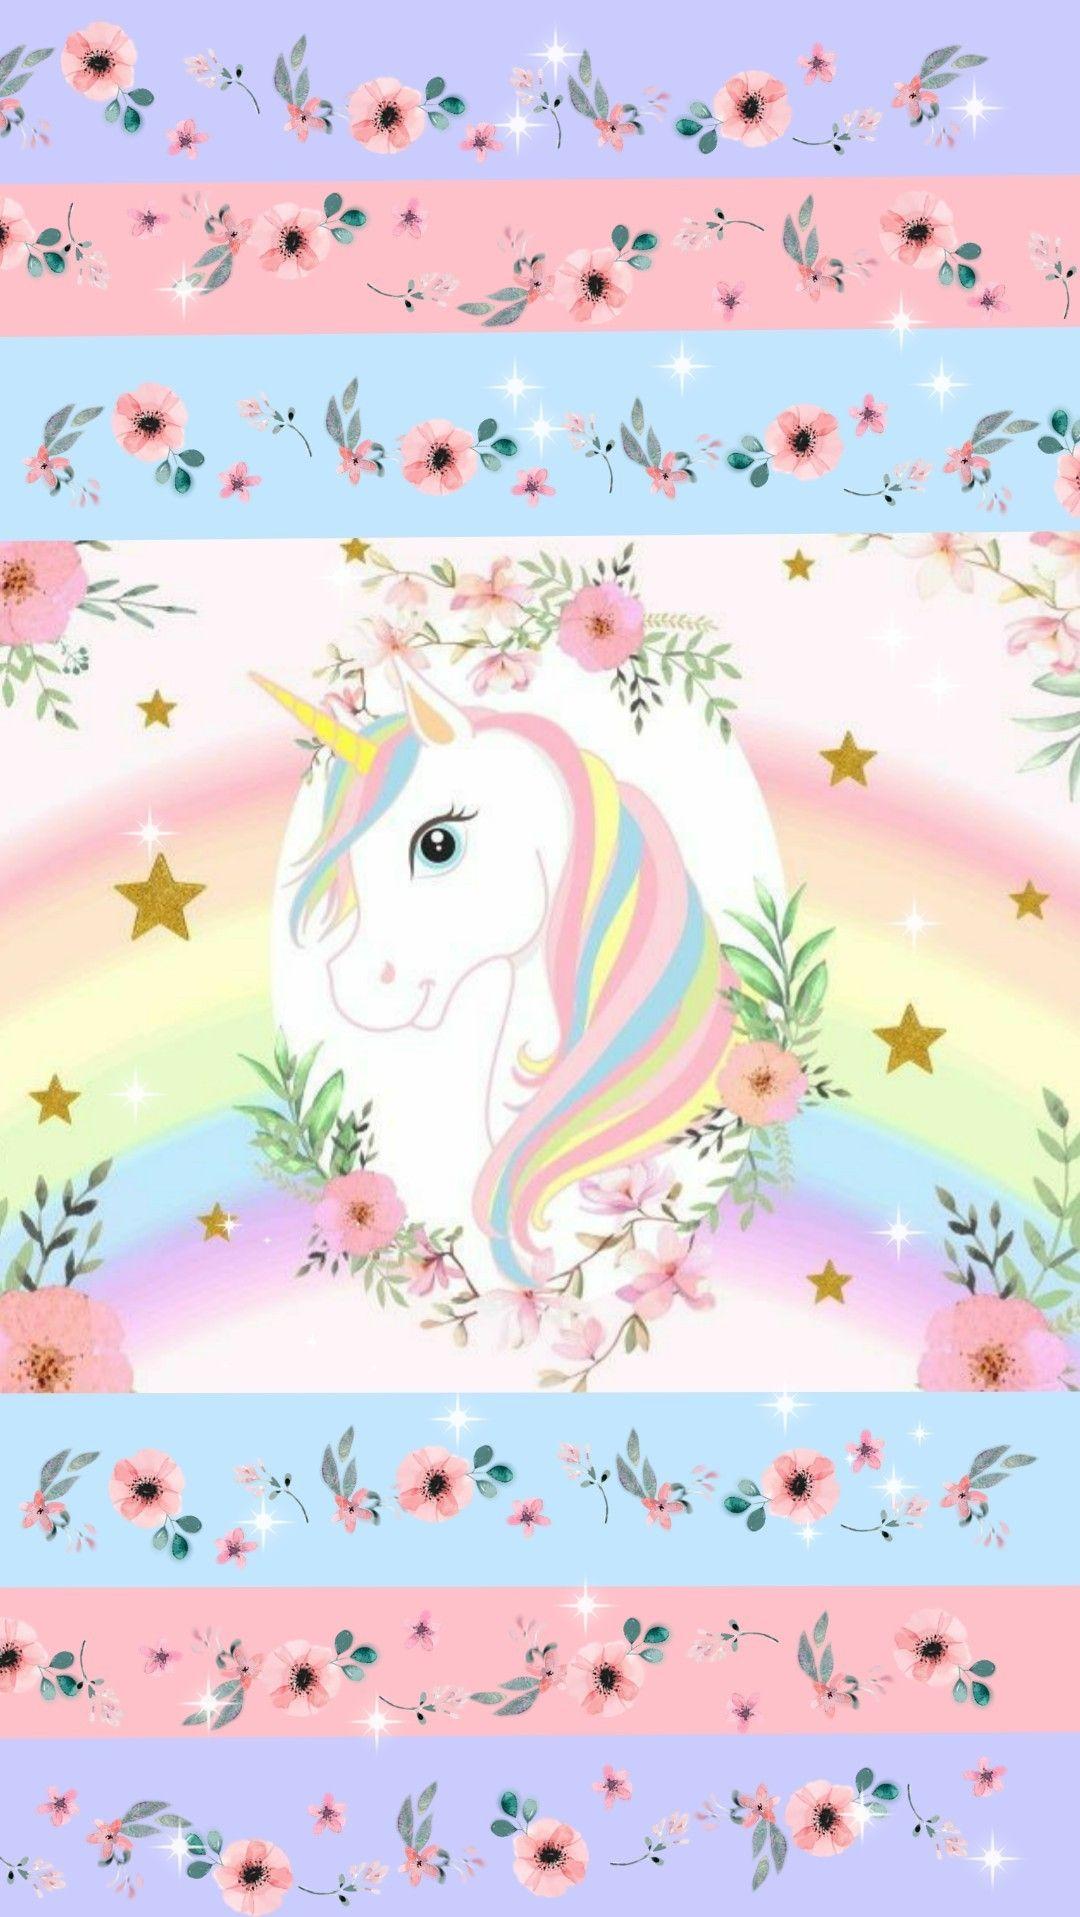 Wallpaper By Artist Unknown Unicorn Wallpaper Unicorn